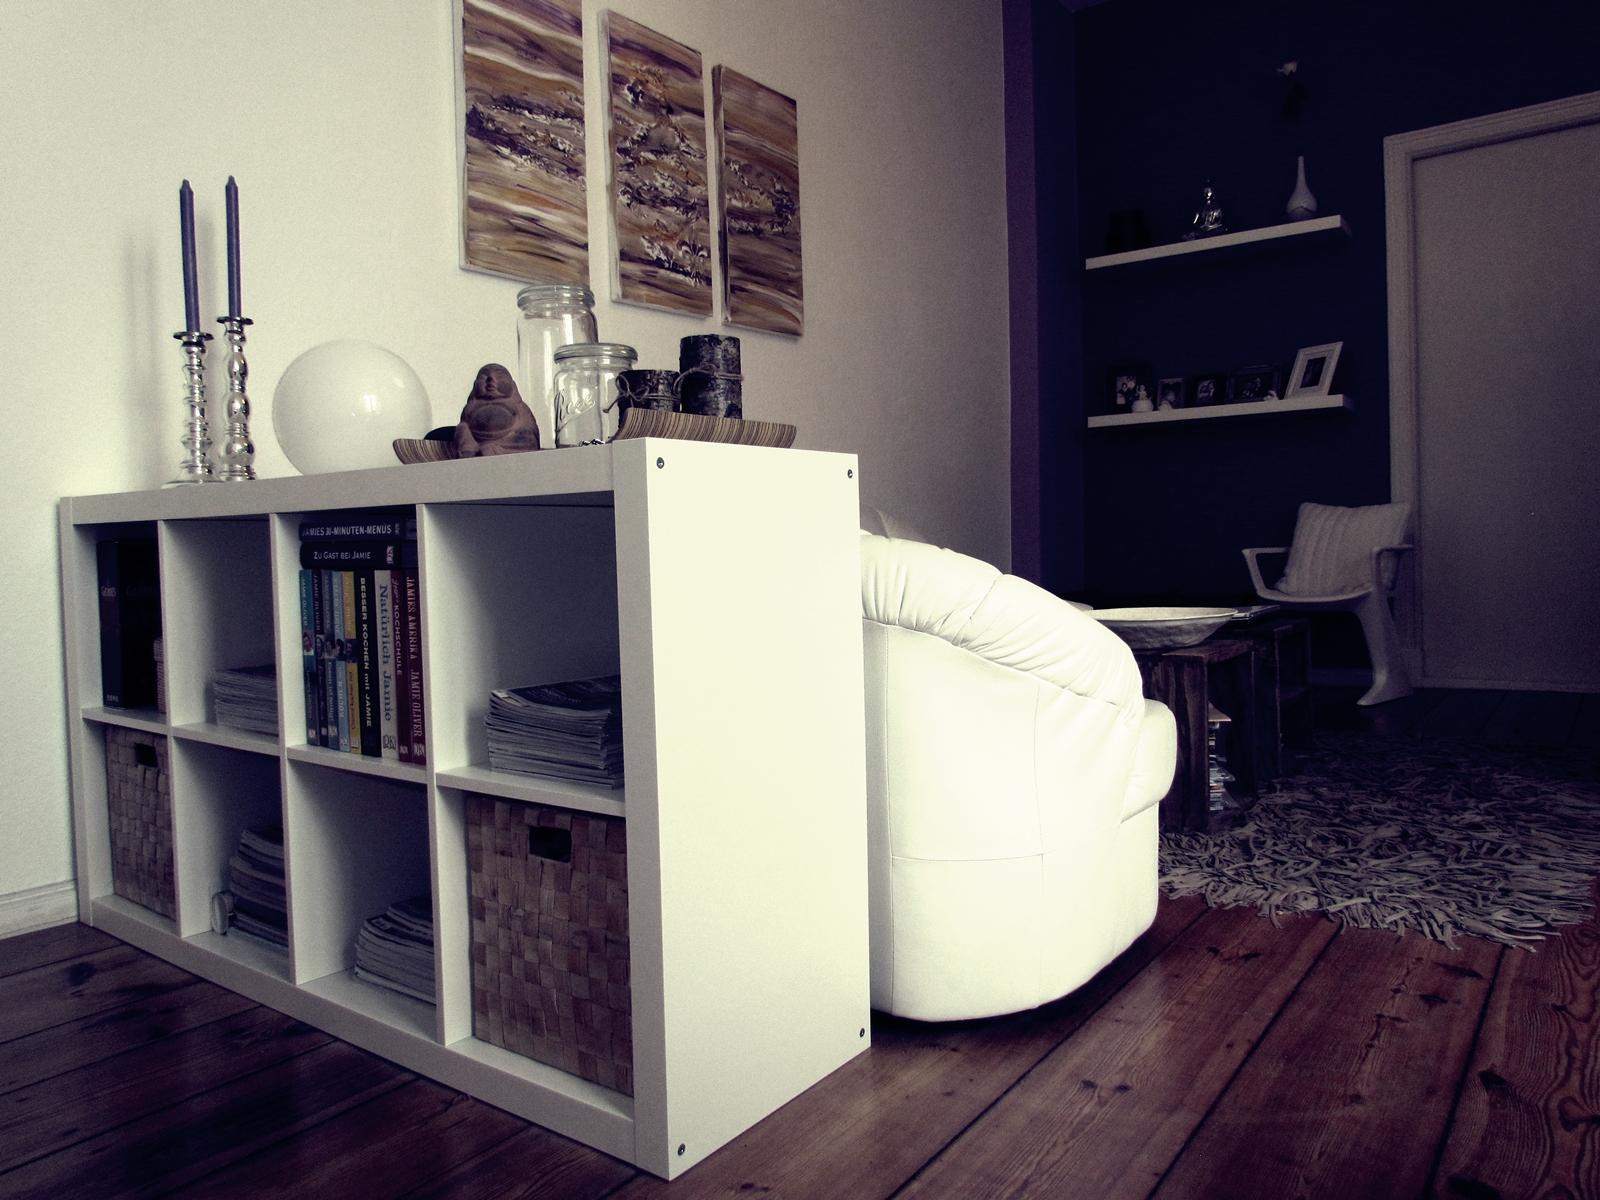 Full Size of Ikea Raumteiler Livingroom Mit Lila Akzenten Wohnzimmer Raum Betten Bei Miniküche Regal Küche Kosten 160x200 Sofa Schlaffunktion Kaufen Modulküche Wohnzimmer Ikea Raumteiler